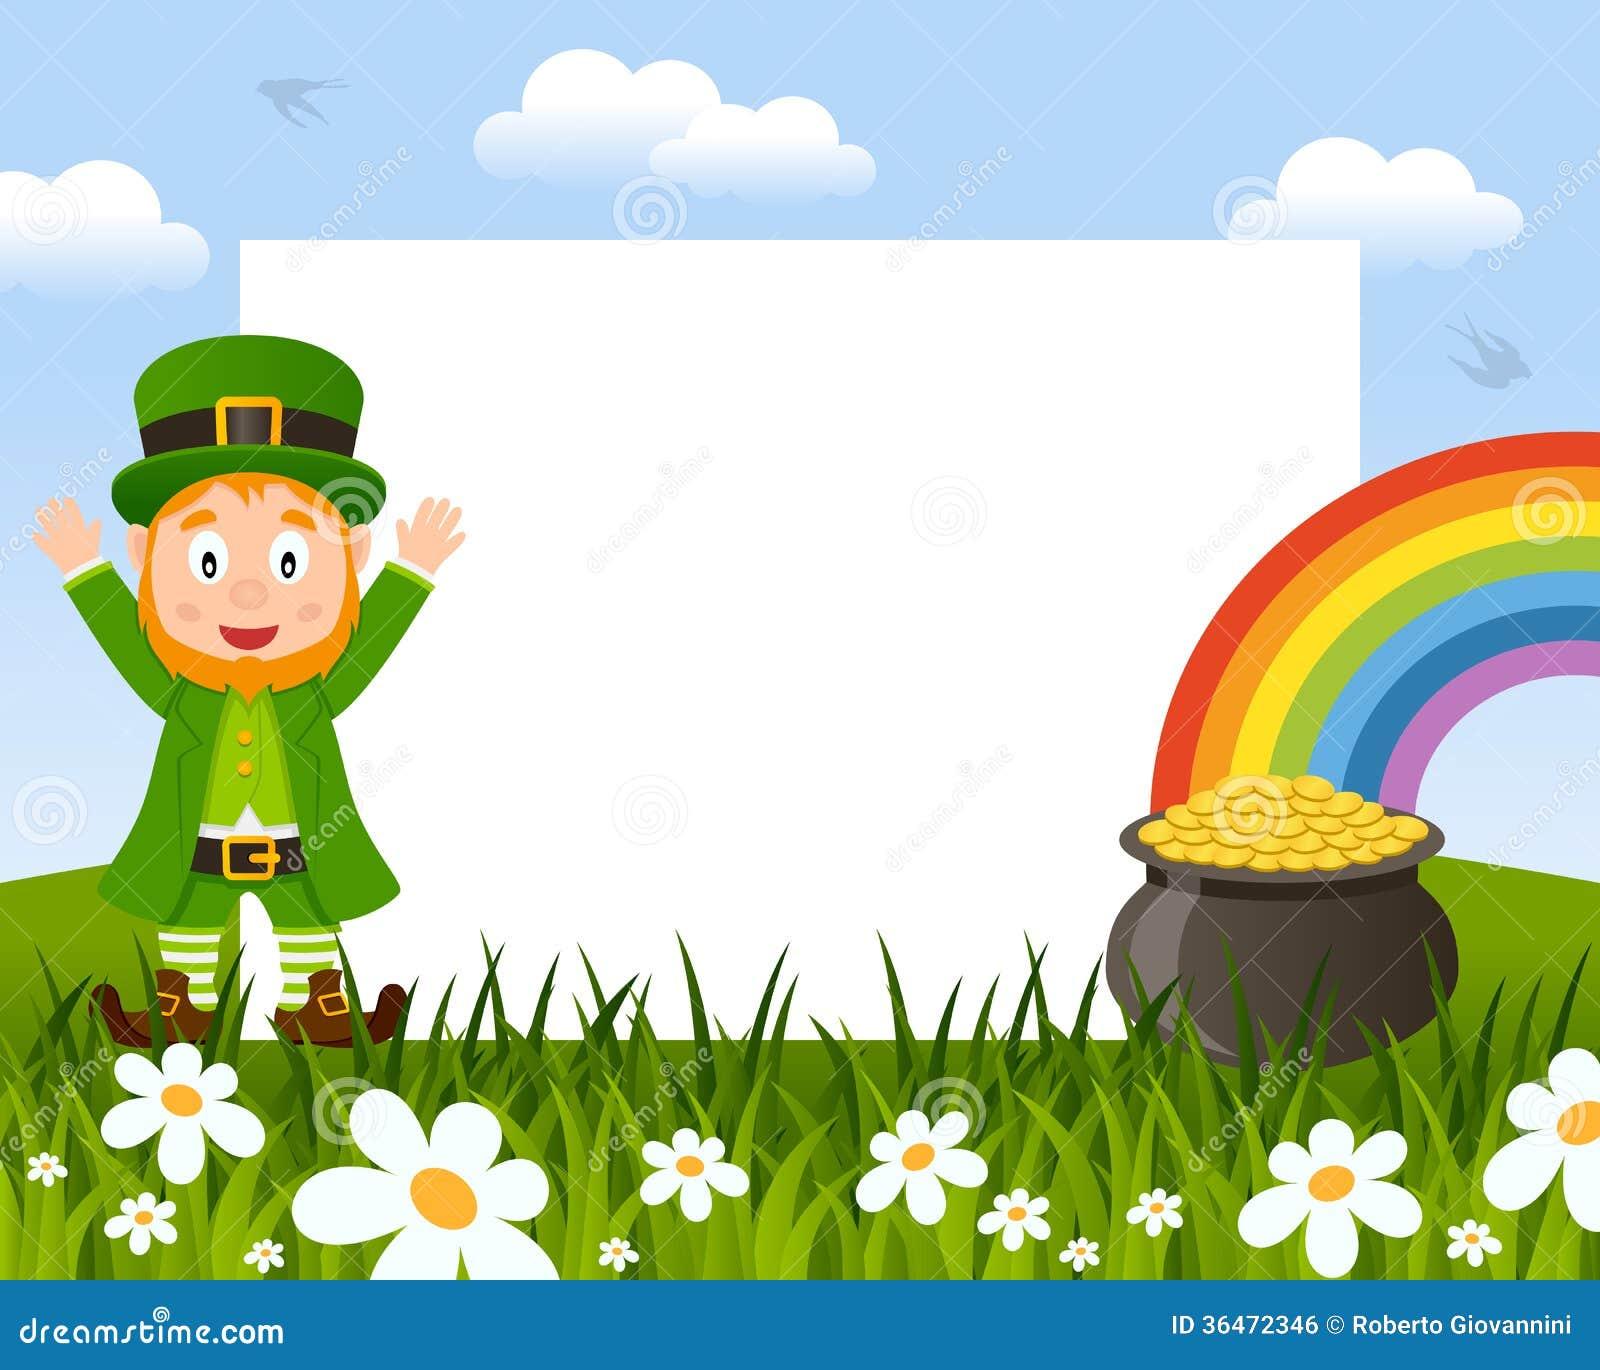 St Patricks Or Saint Patrick S Day Horizontal Photo Frame With A